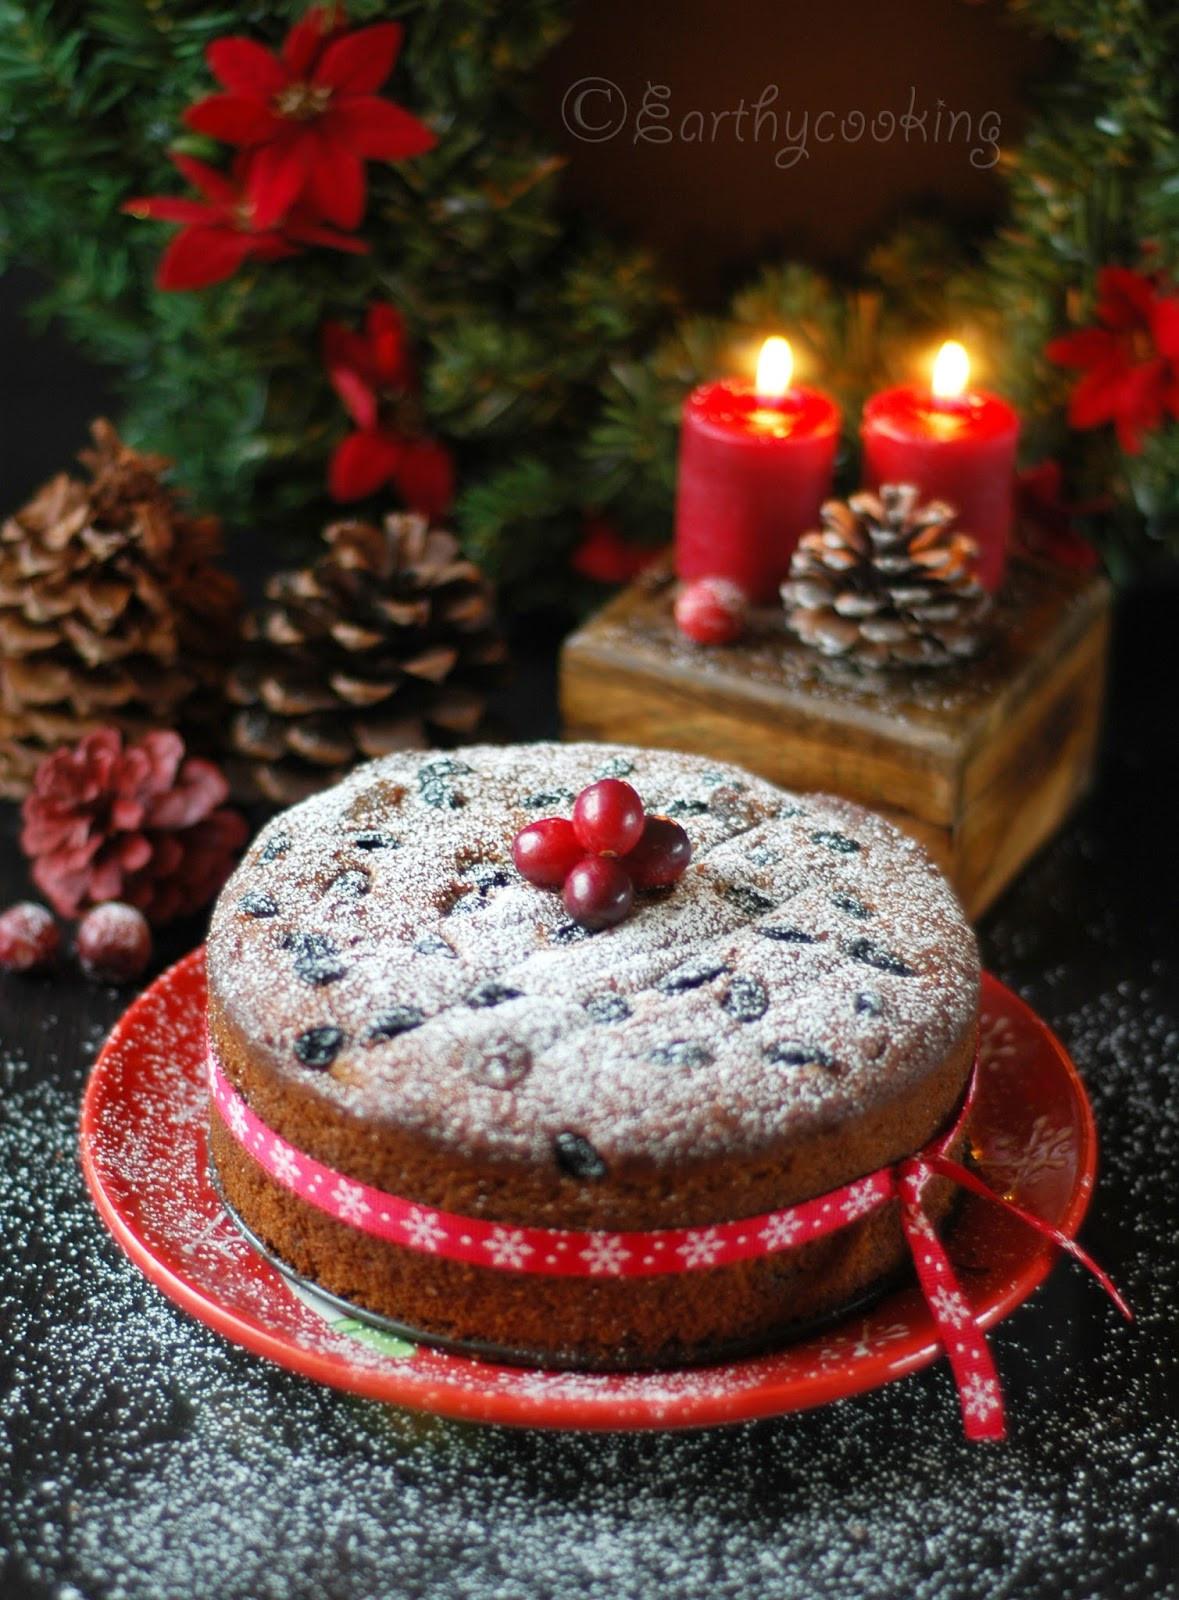 Christmas Fruit Cake Recipe With Rum  Earthycooking Rum Soaked Christmas Fruit Cake